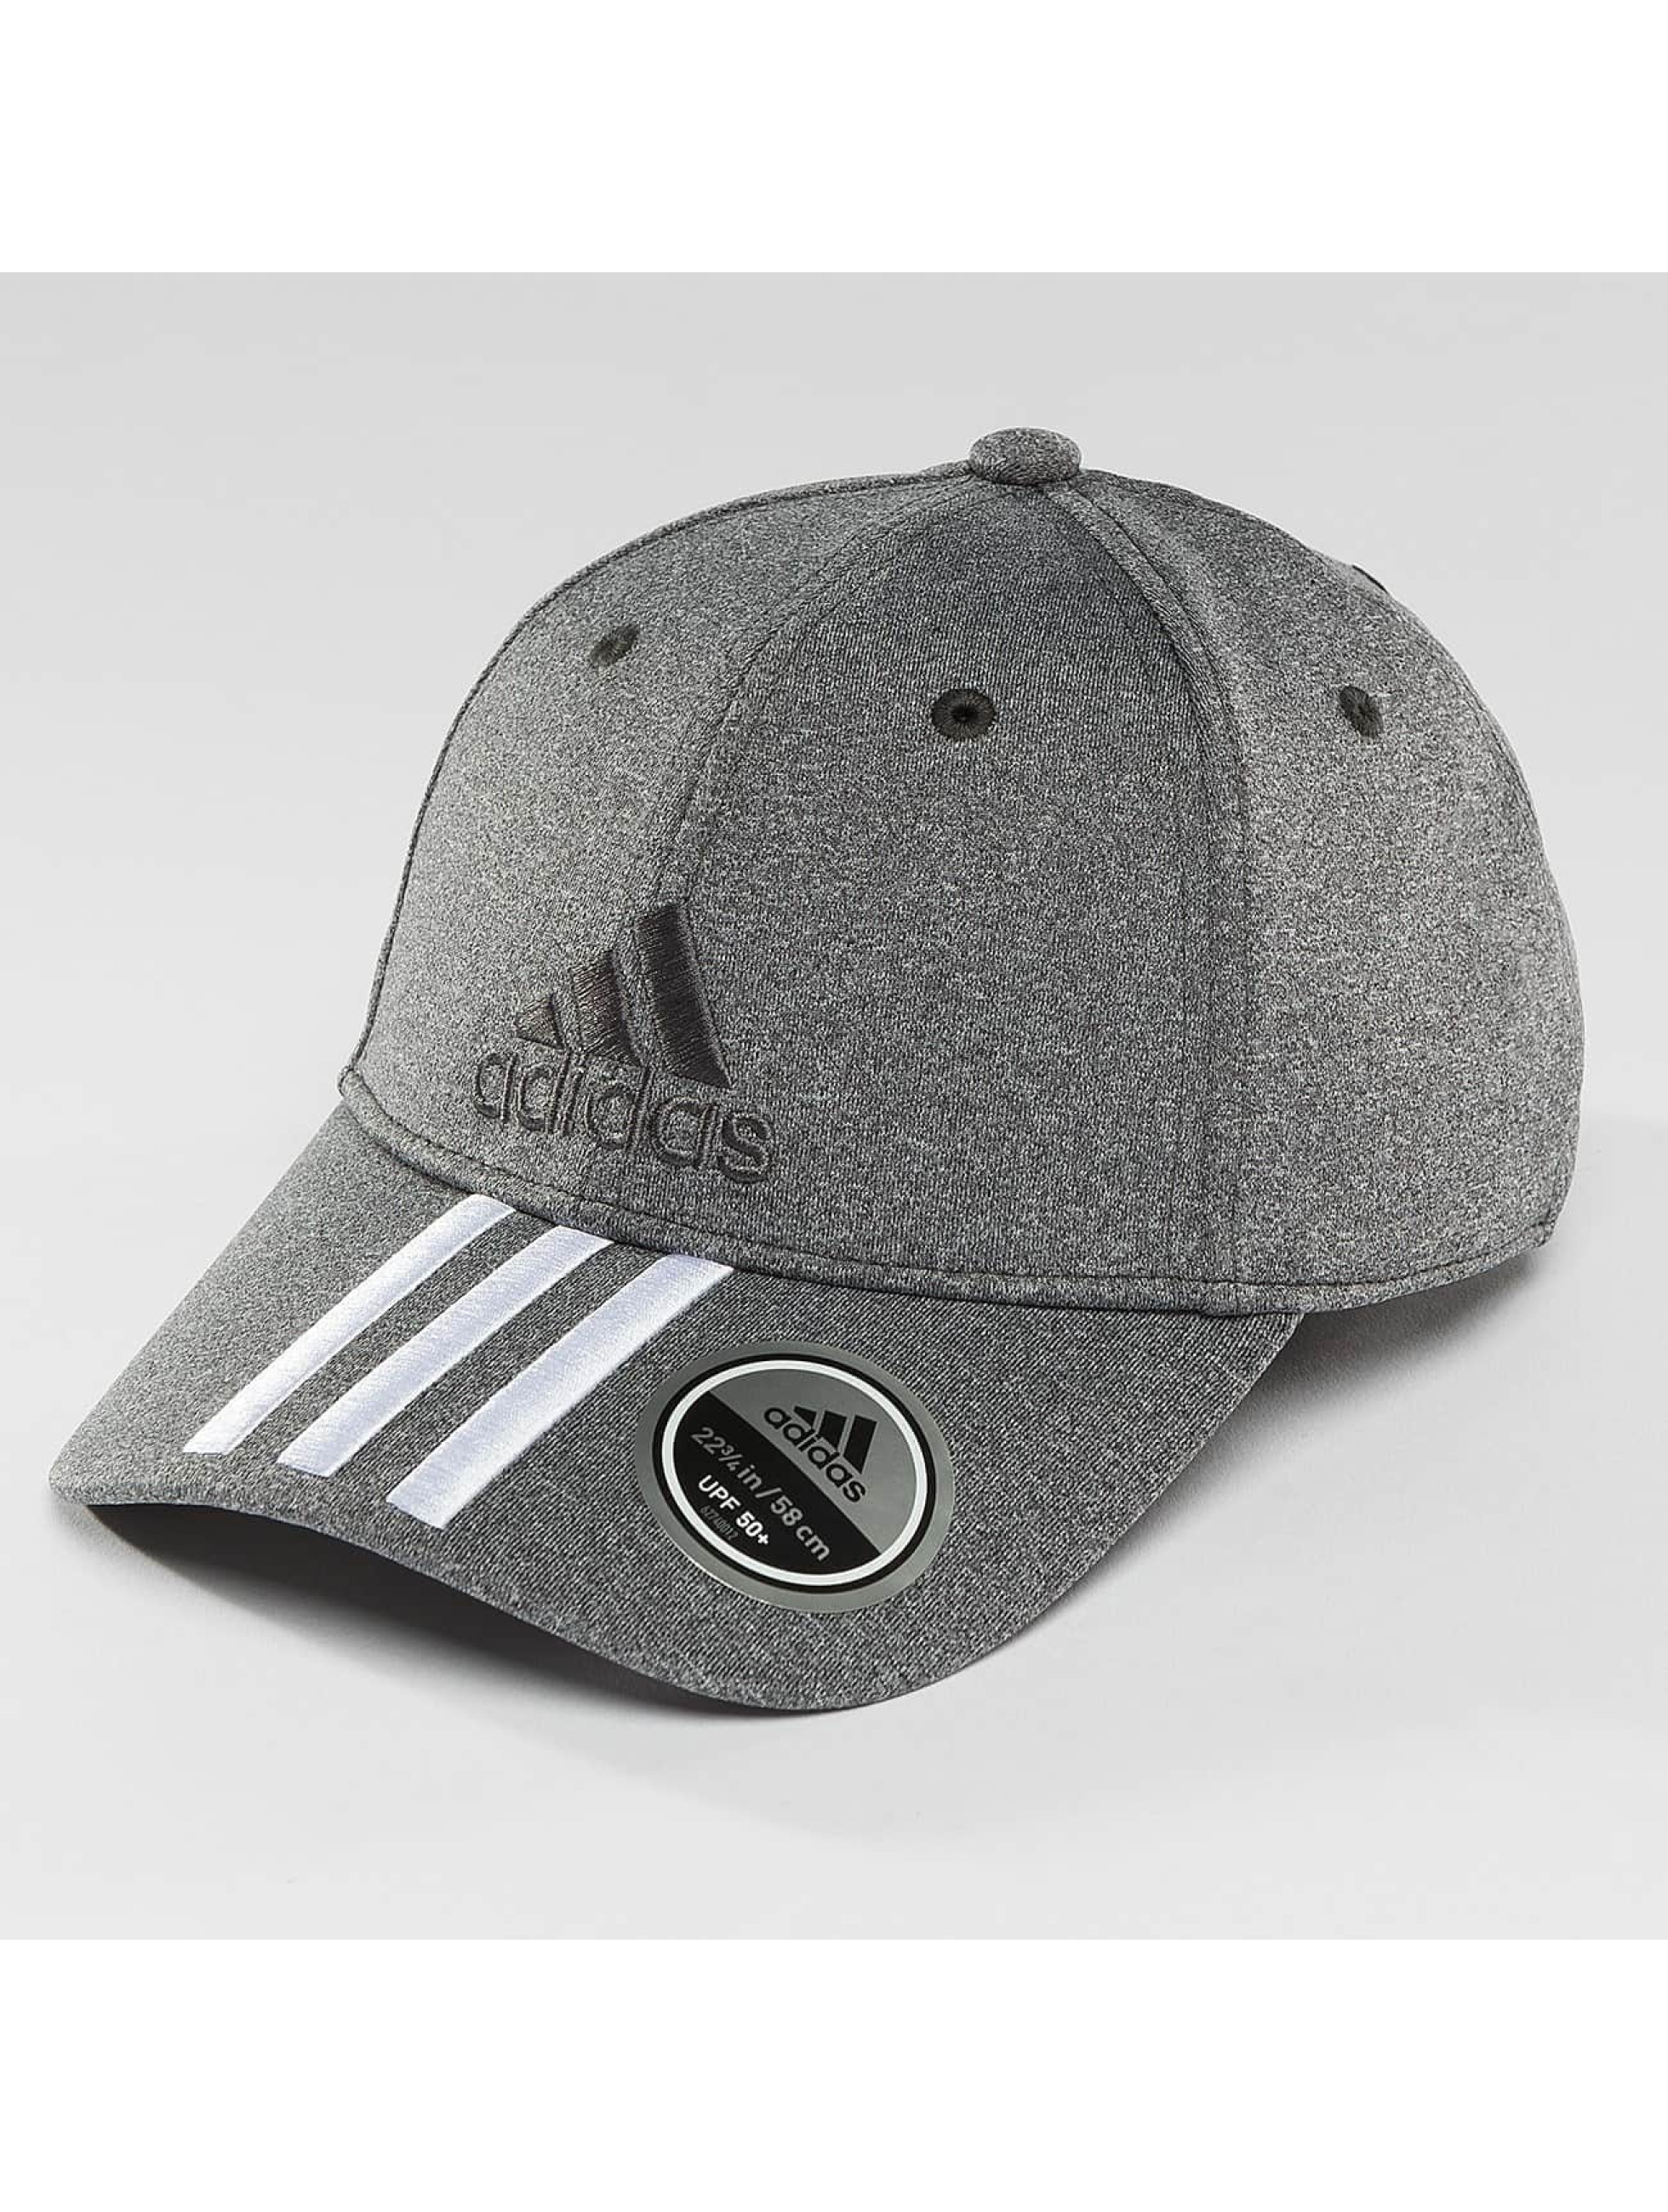 adidas Performance Snapback Caps Snapback Cap harmaa